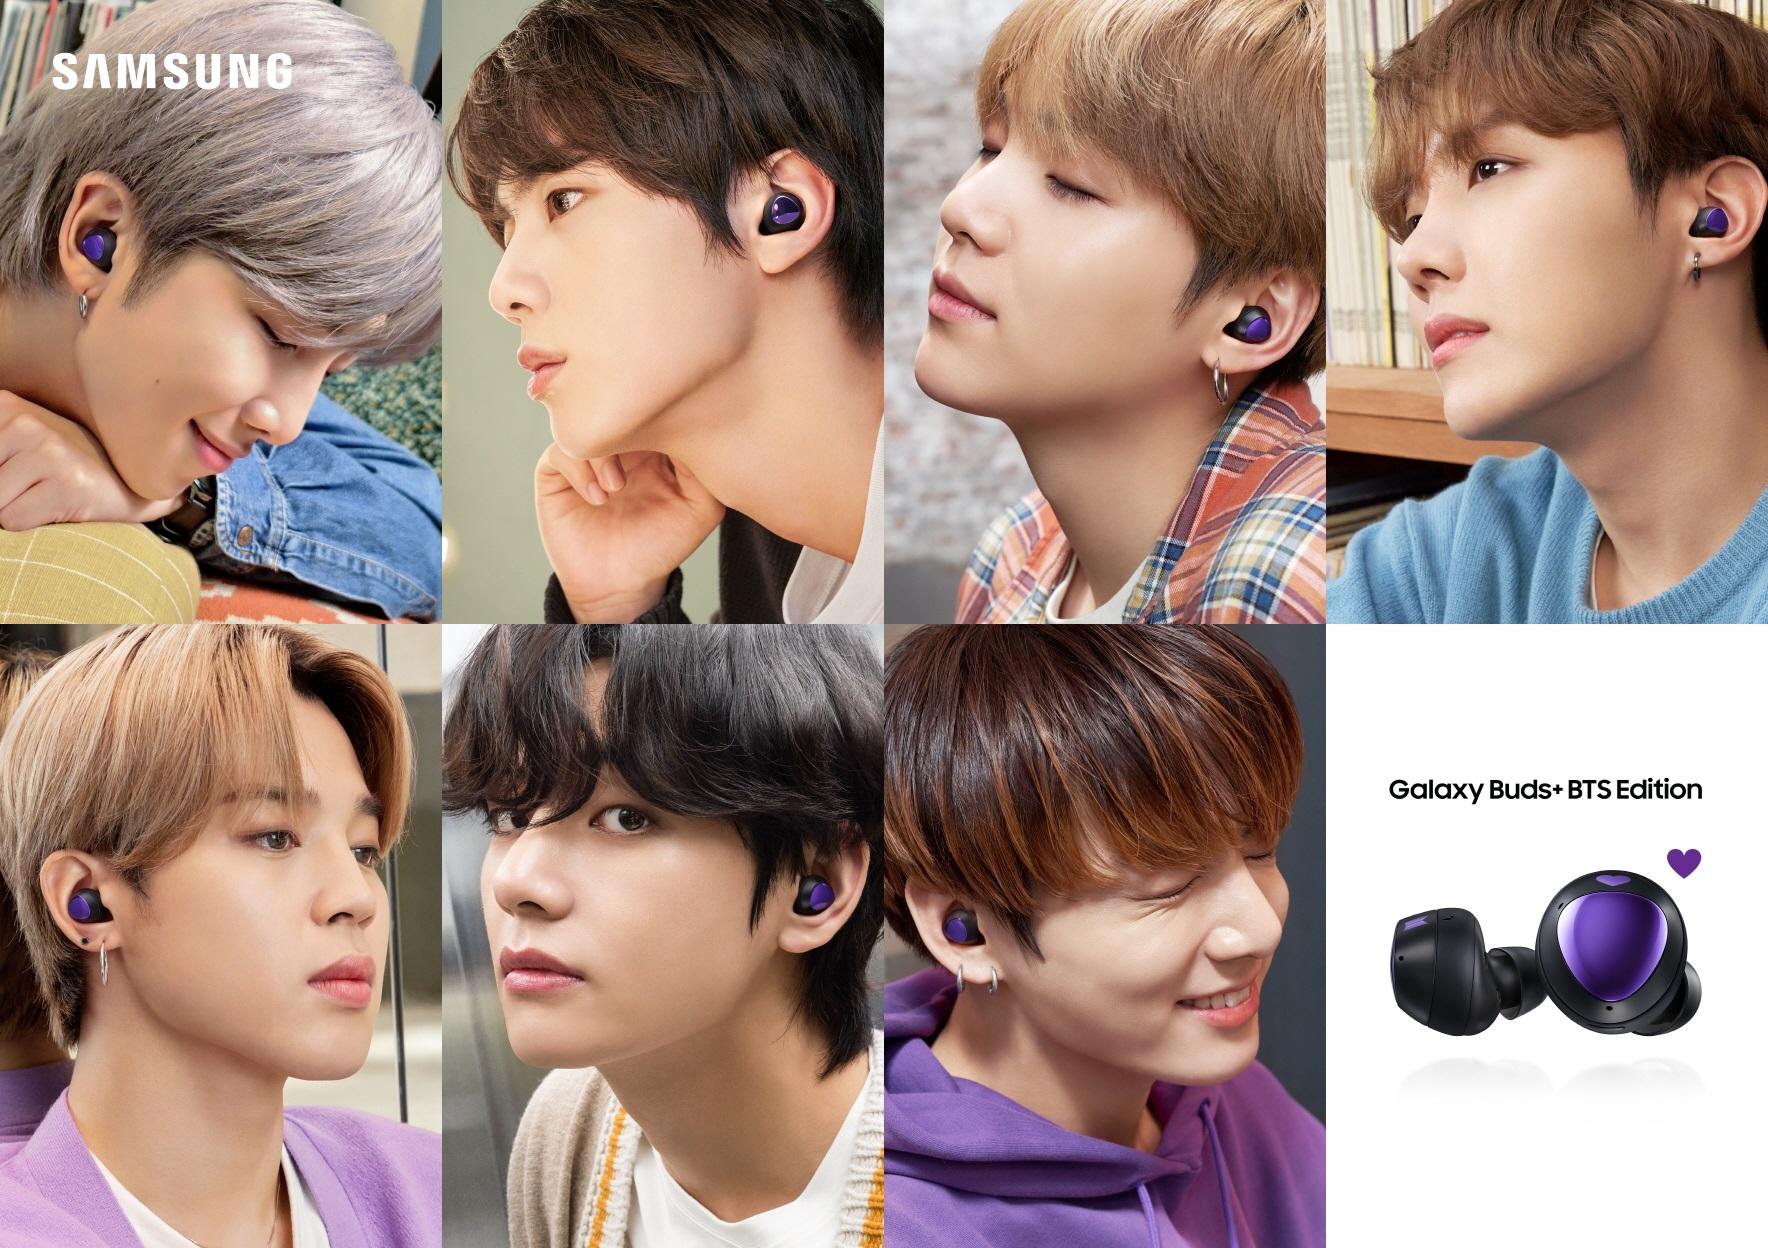 2】Galaxy Buds+ BTS Edition以嶄新的紫色愛心設計,象徵BTS防彈少年團與全球粉絲緊密連結